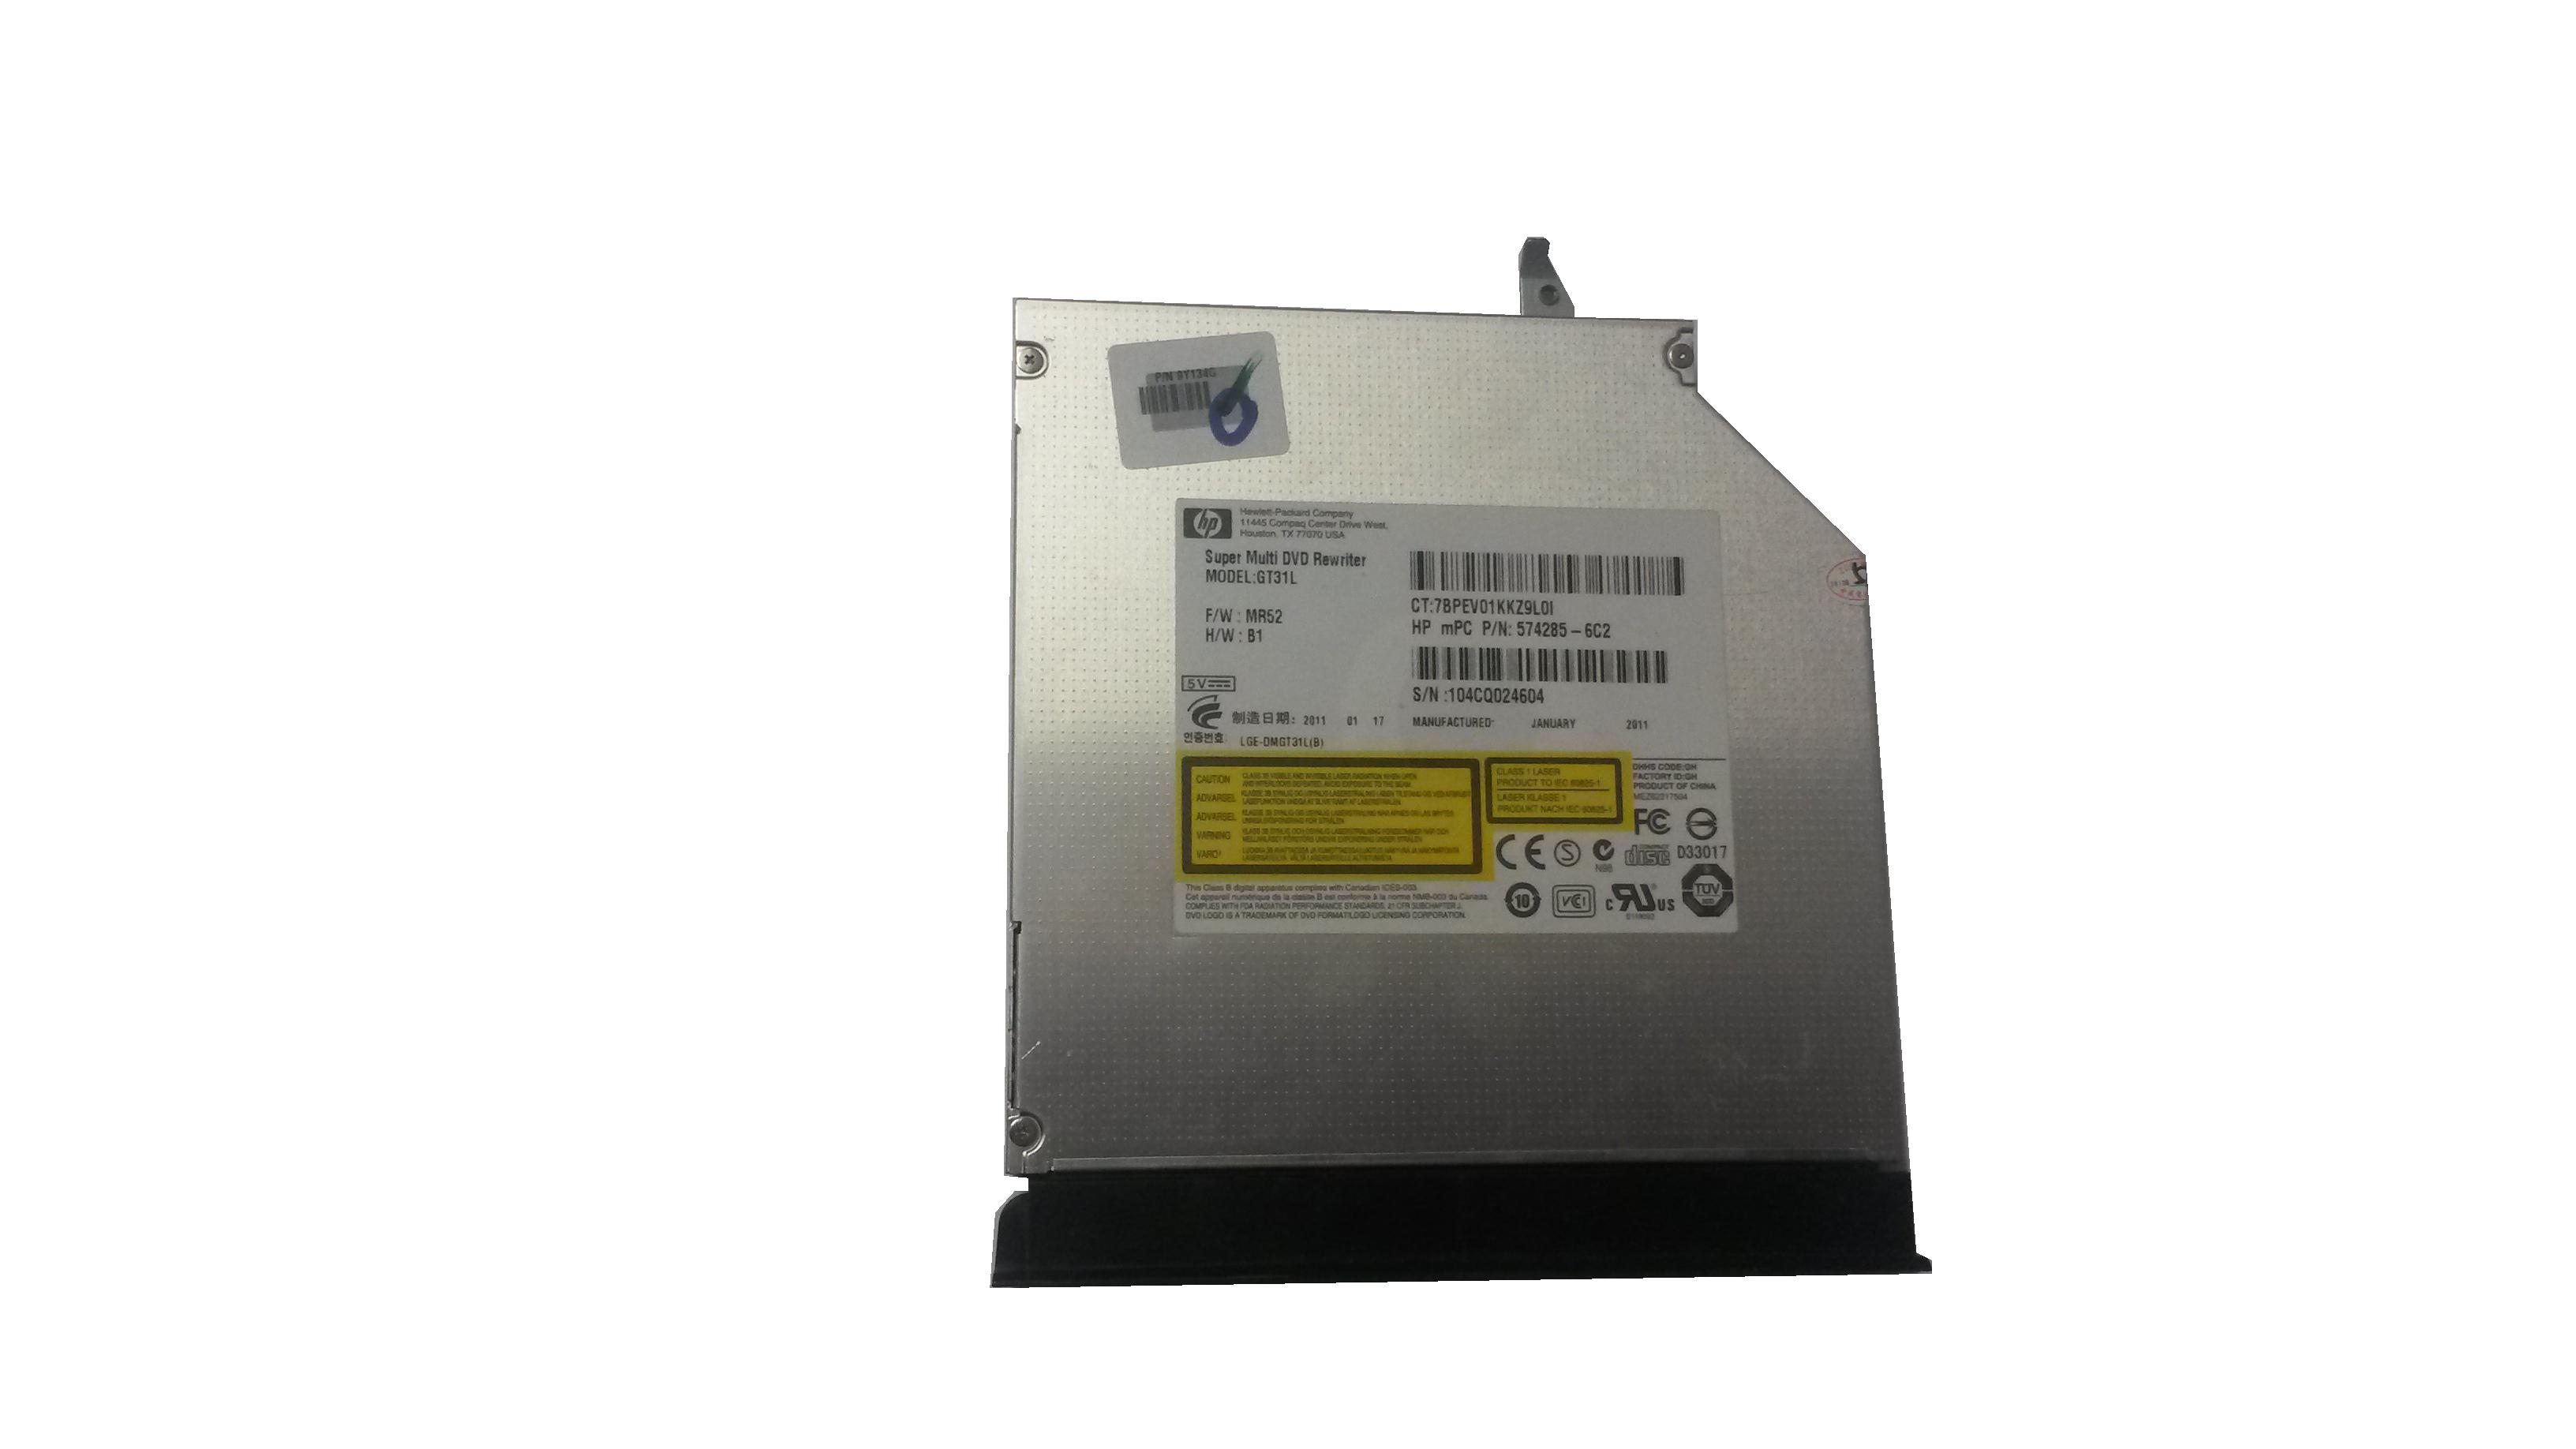 HP 630 DVD író elõlappal 23bea169fc